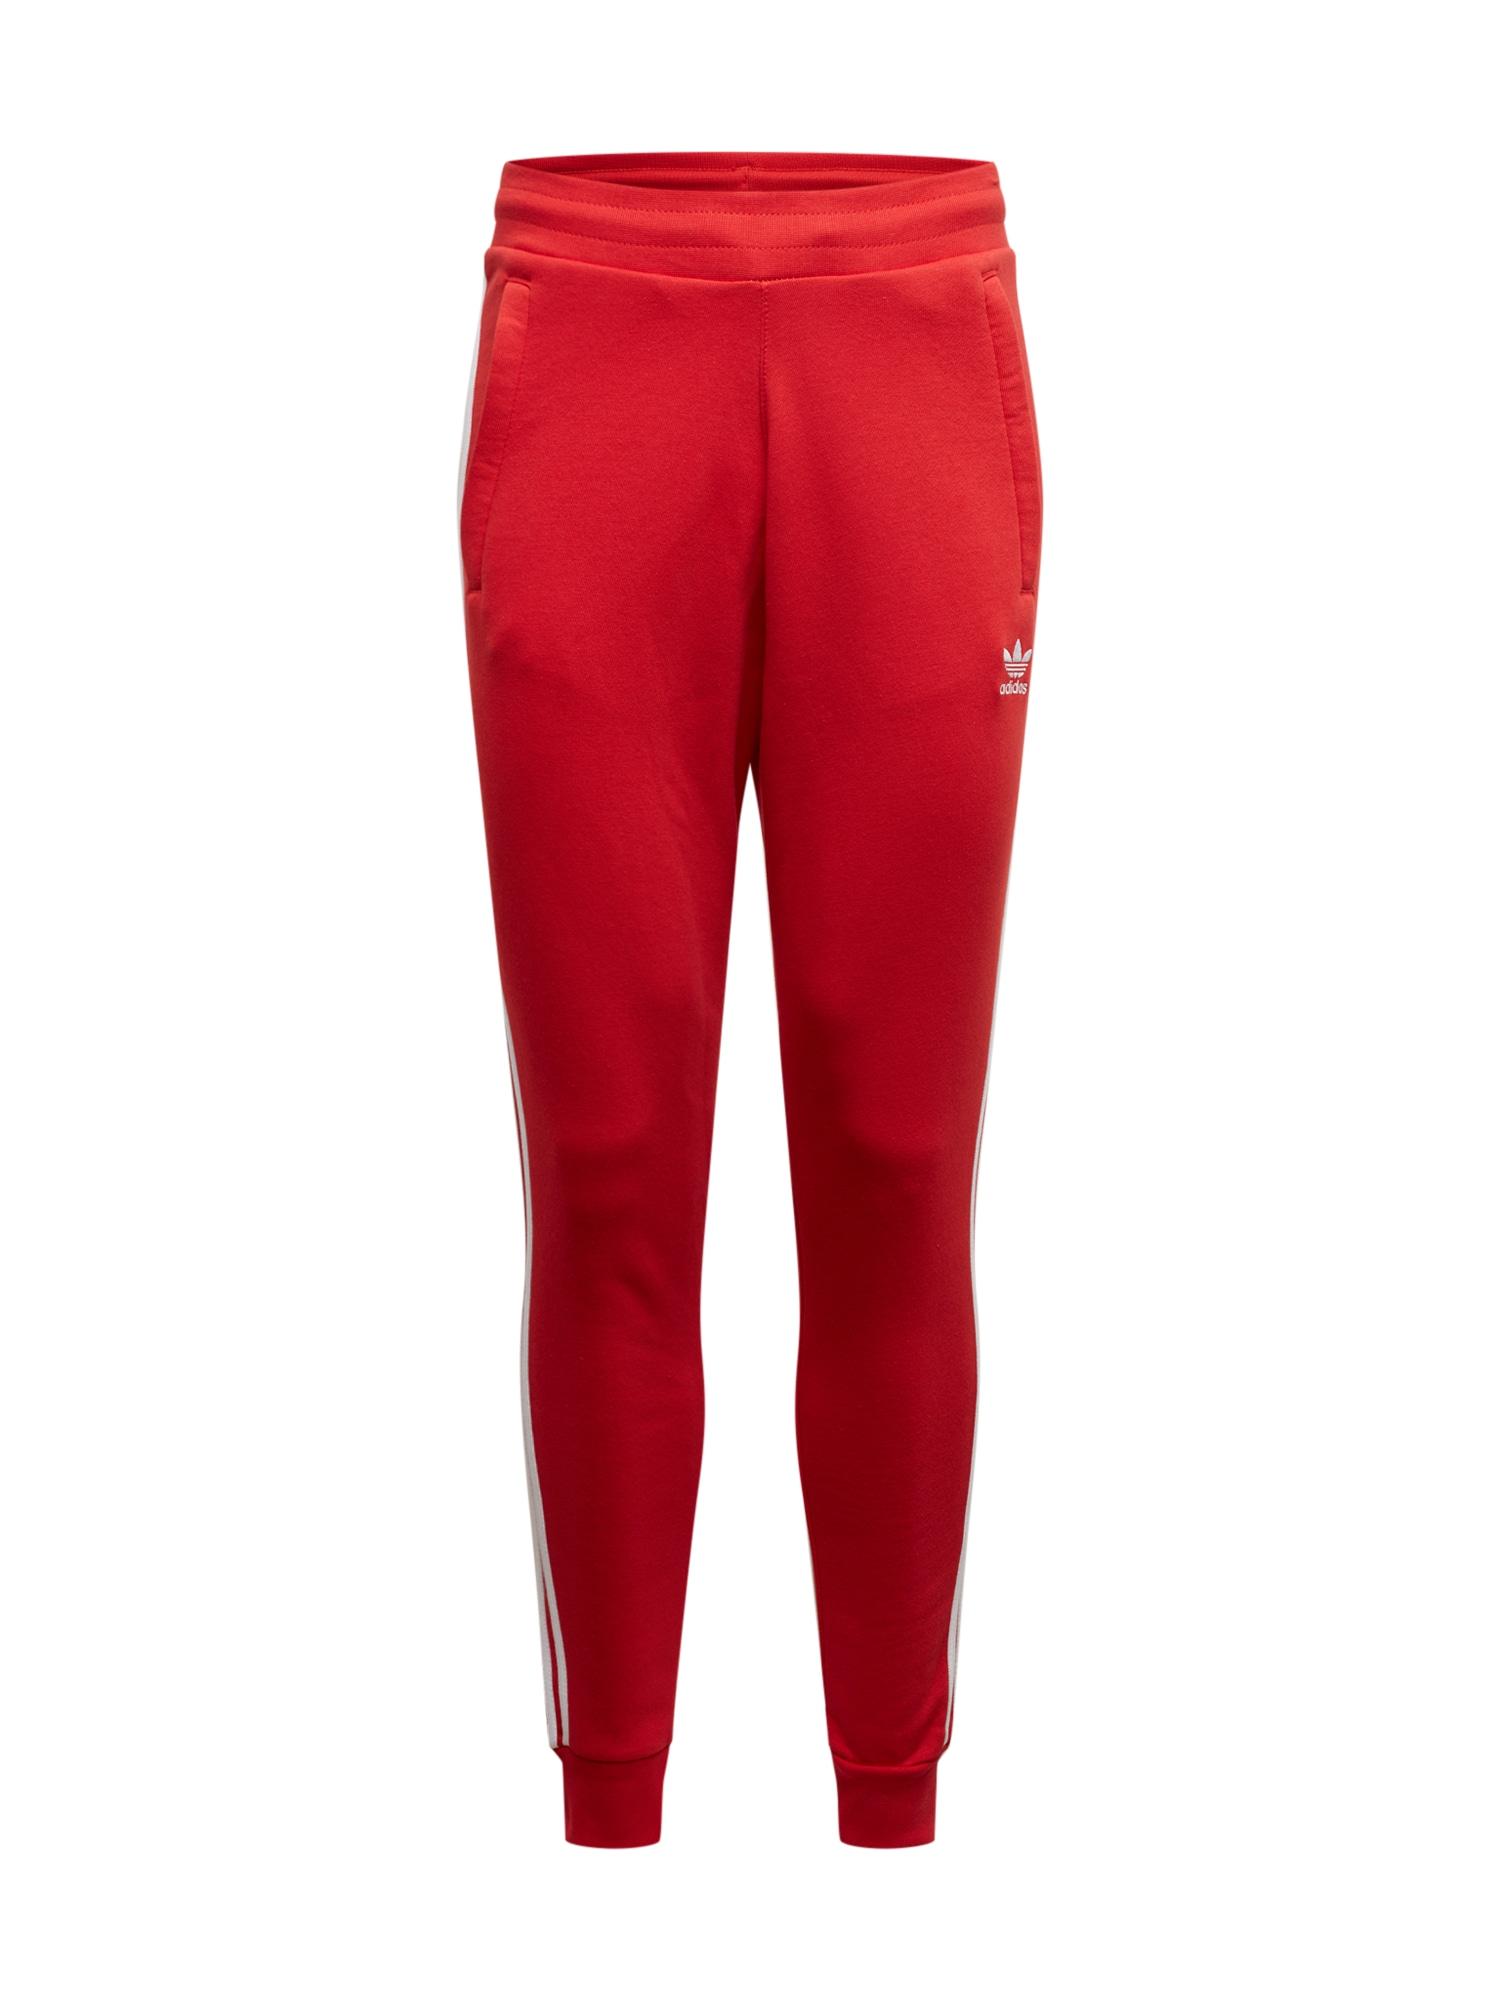 ADIDAS ORIGINALS Kalhoty  červená